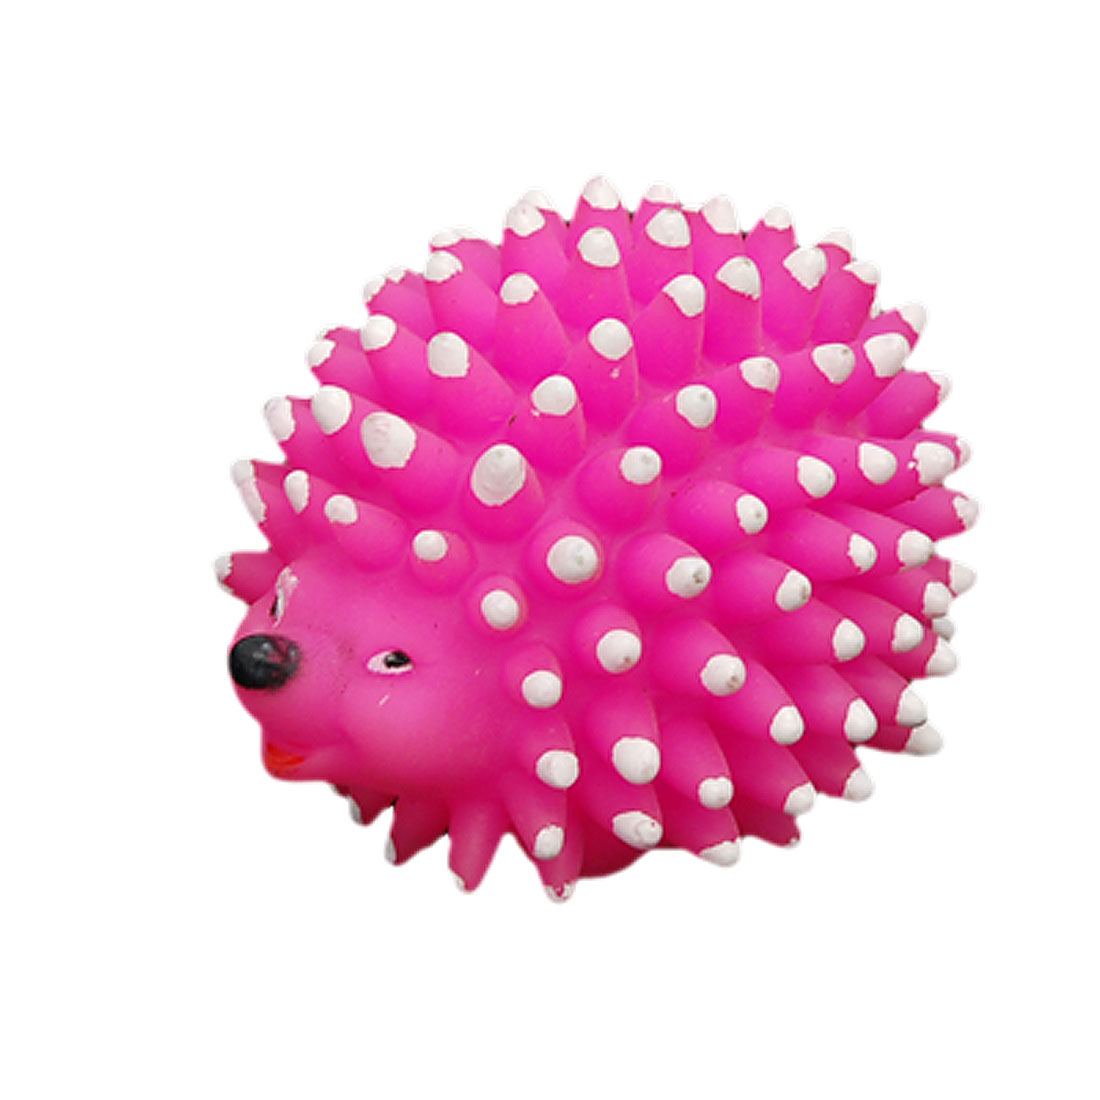 Hedgehog Style Pet Dog Puppy Chew Squeak Squeaky Toy